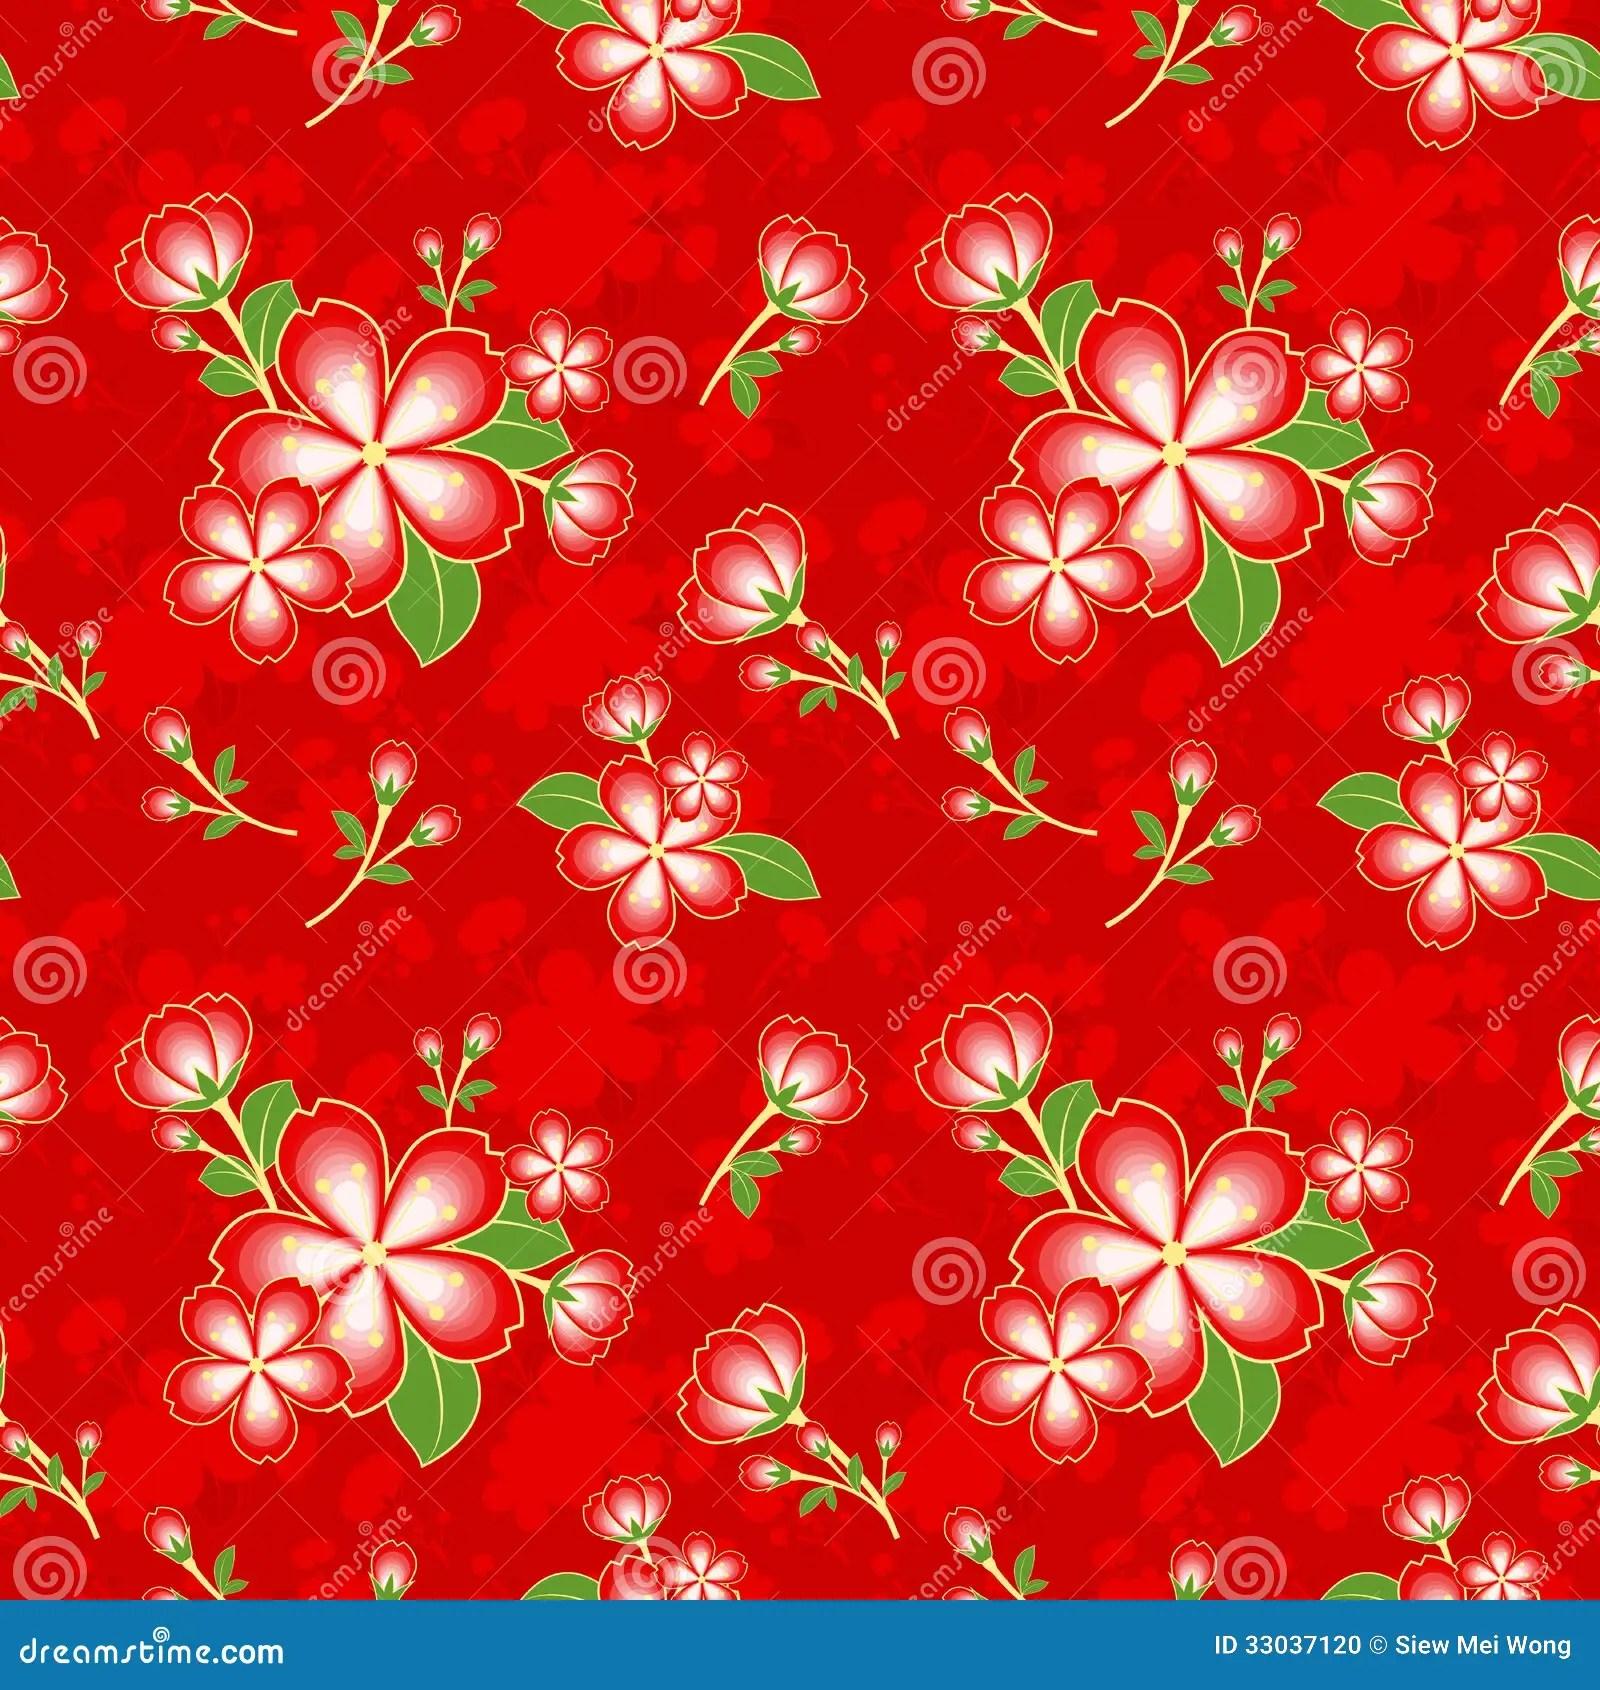 3d Cherry Blossom Wallpaper Oriental Flower Chinese Seamless Pattern Stock Photo